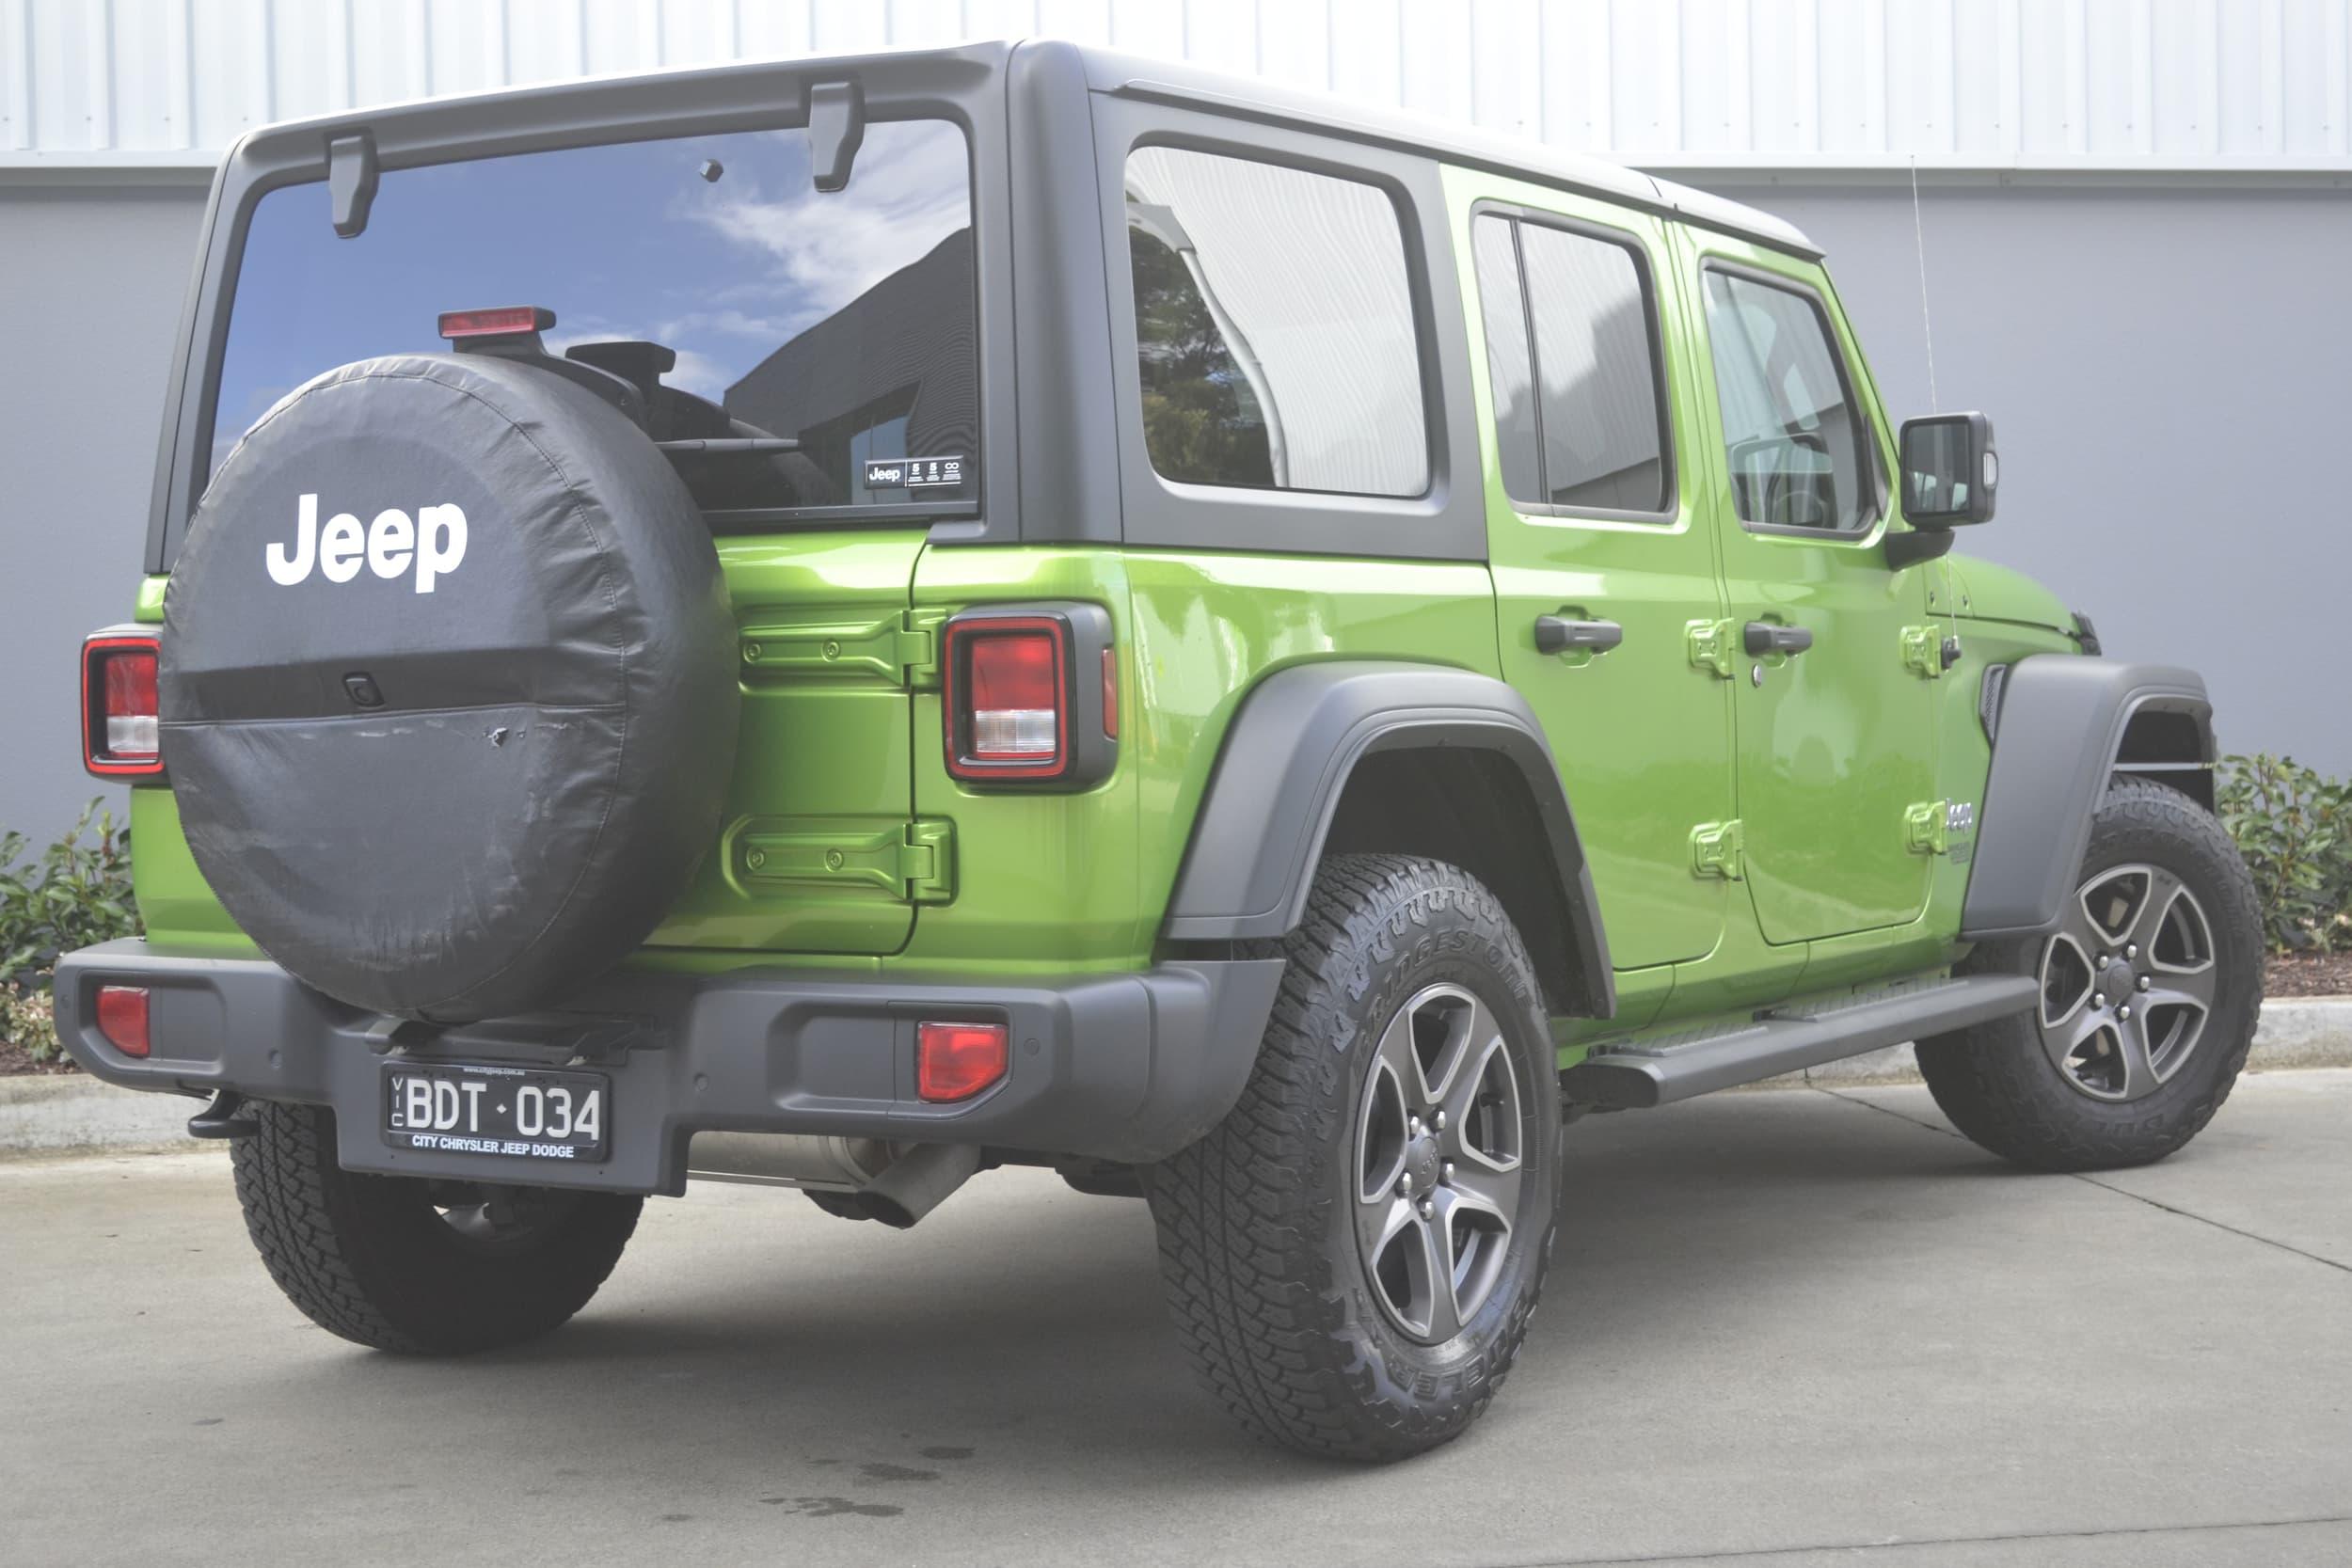 2019 Jeep Wrangler Unlimited Sport S Auto 4x4 MY19 - image 3